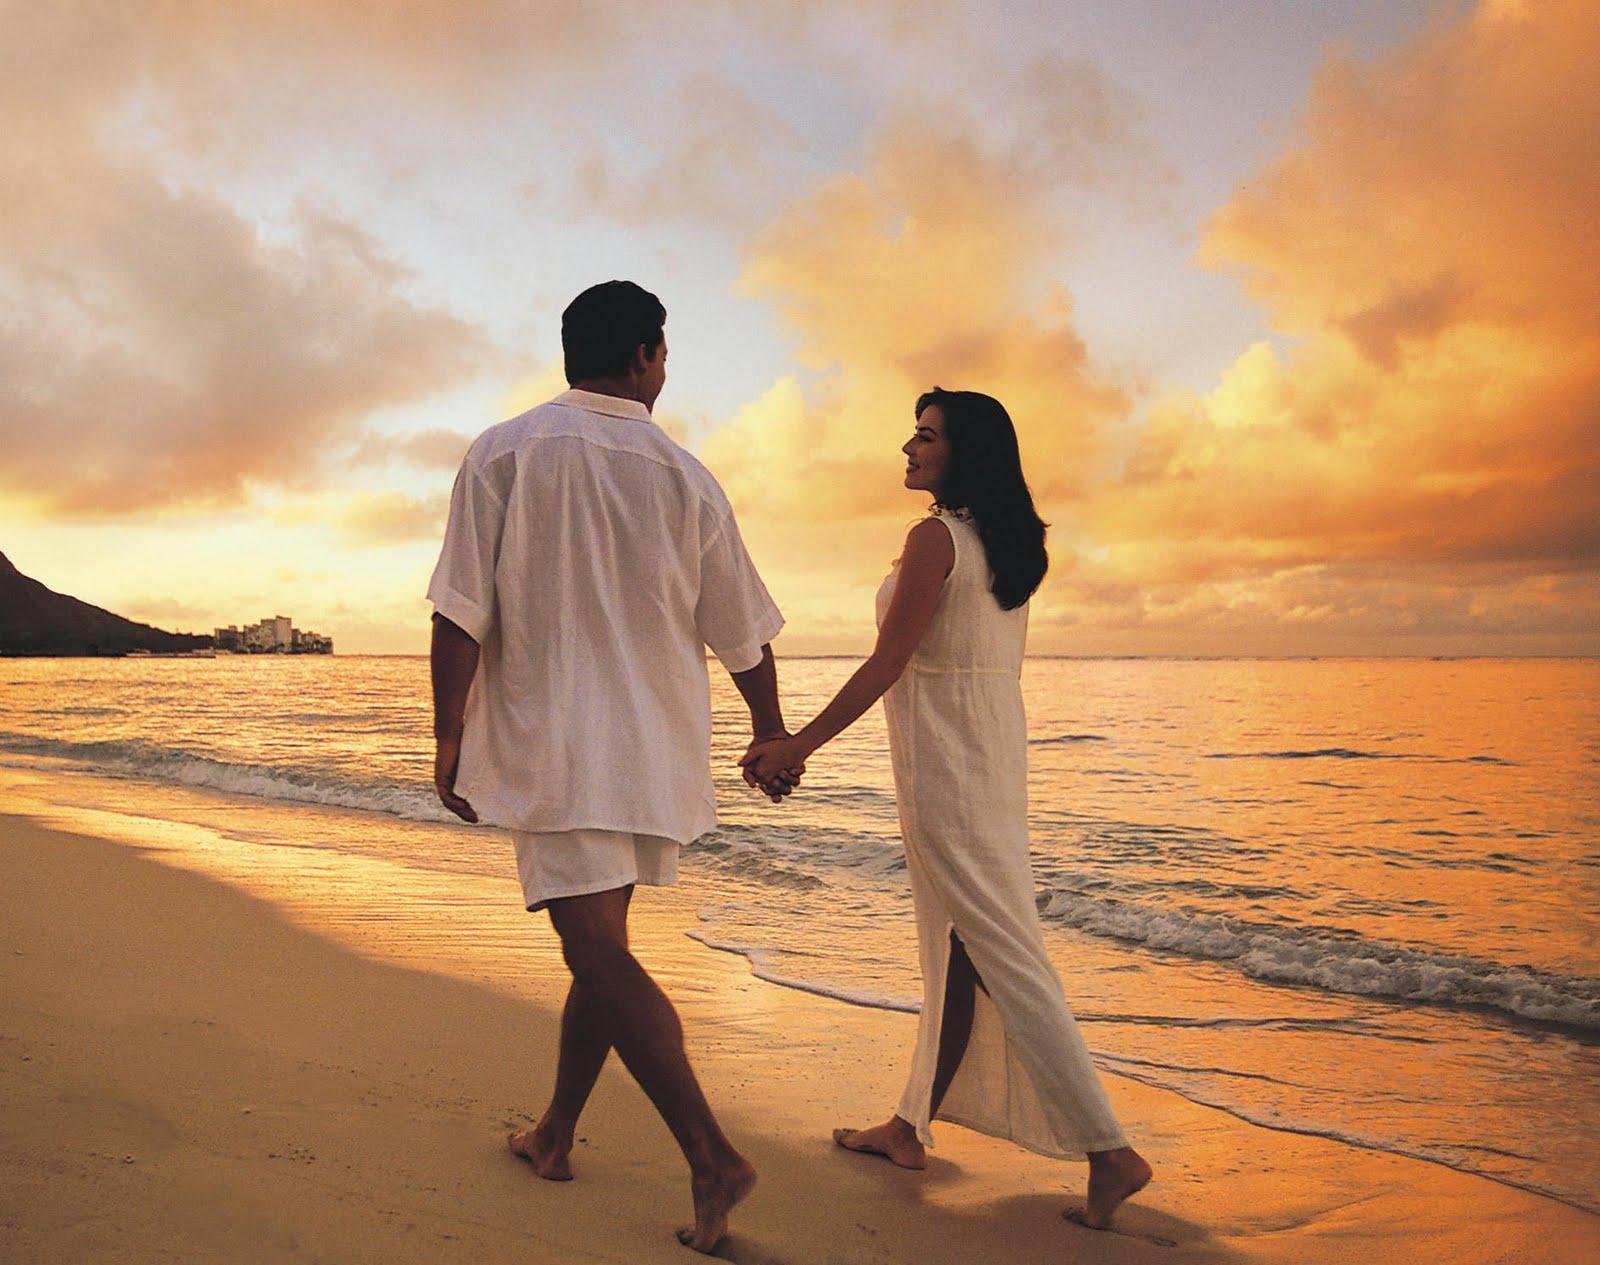 beach-love-couple-wallpaper